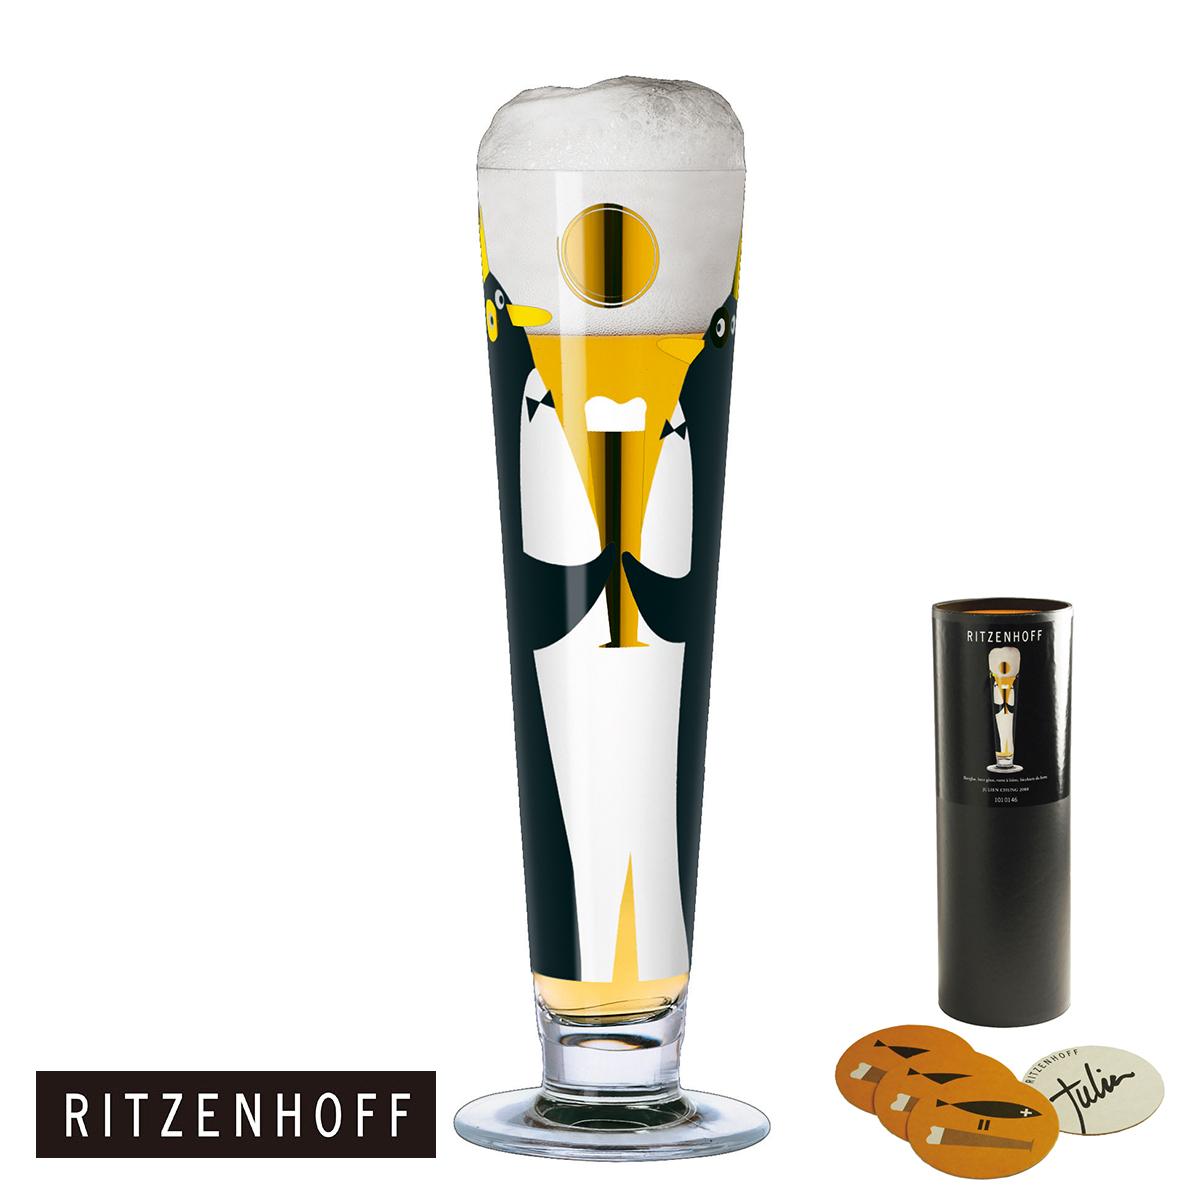 RITZENHOFF/啤酒 / 啤酒 (朱利安忠) Ritzenhoff 啤酒晶體集合啤酒眼鏡、 禮品、 禮品、 禮物和慶祝,新娘的禮物,02P01Aug15